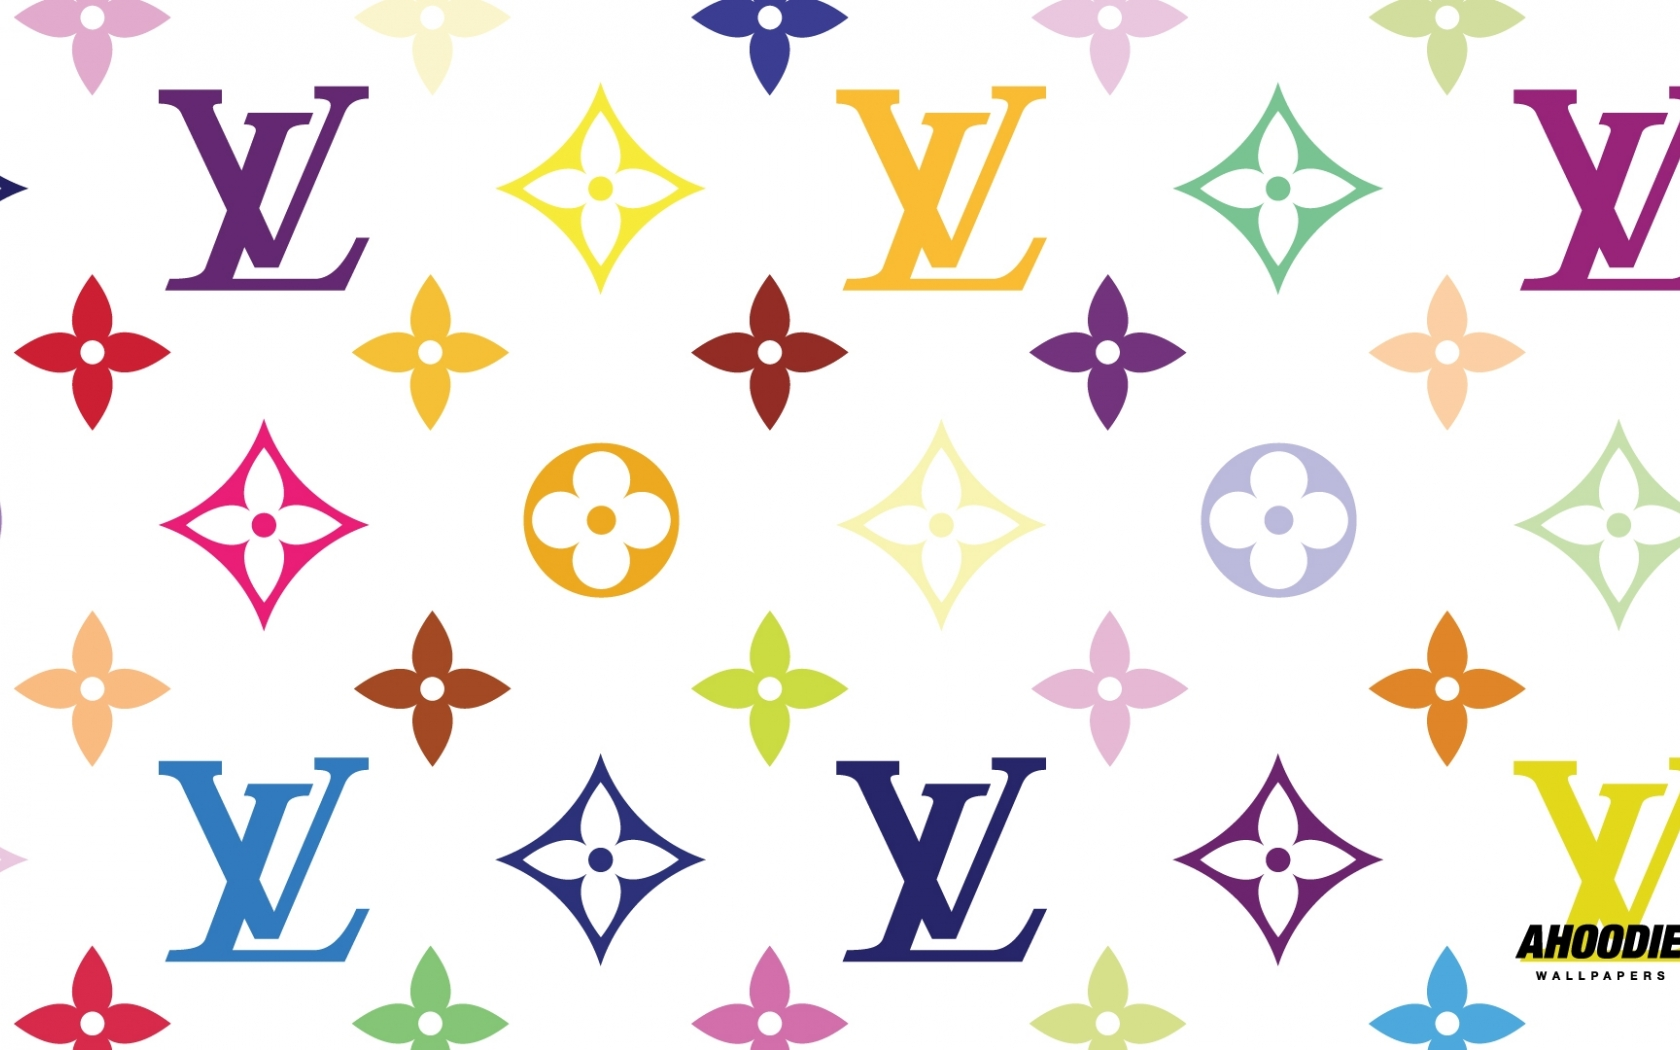 Hd Wallpapers Louis Vuitton Wallpaper Pin Monogram Louis Vuitton 2861885 Hd Wallpaper Backgrounds Download